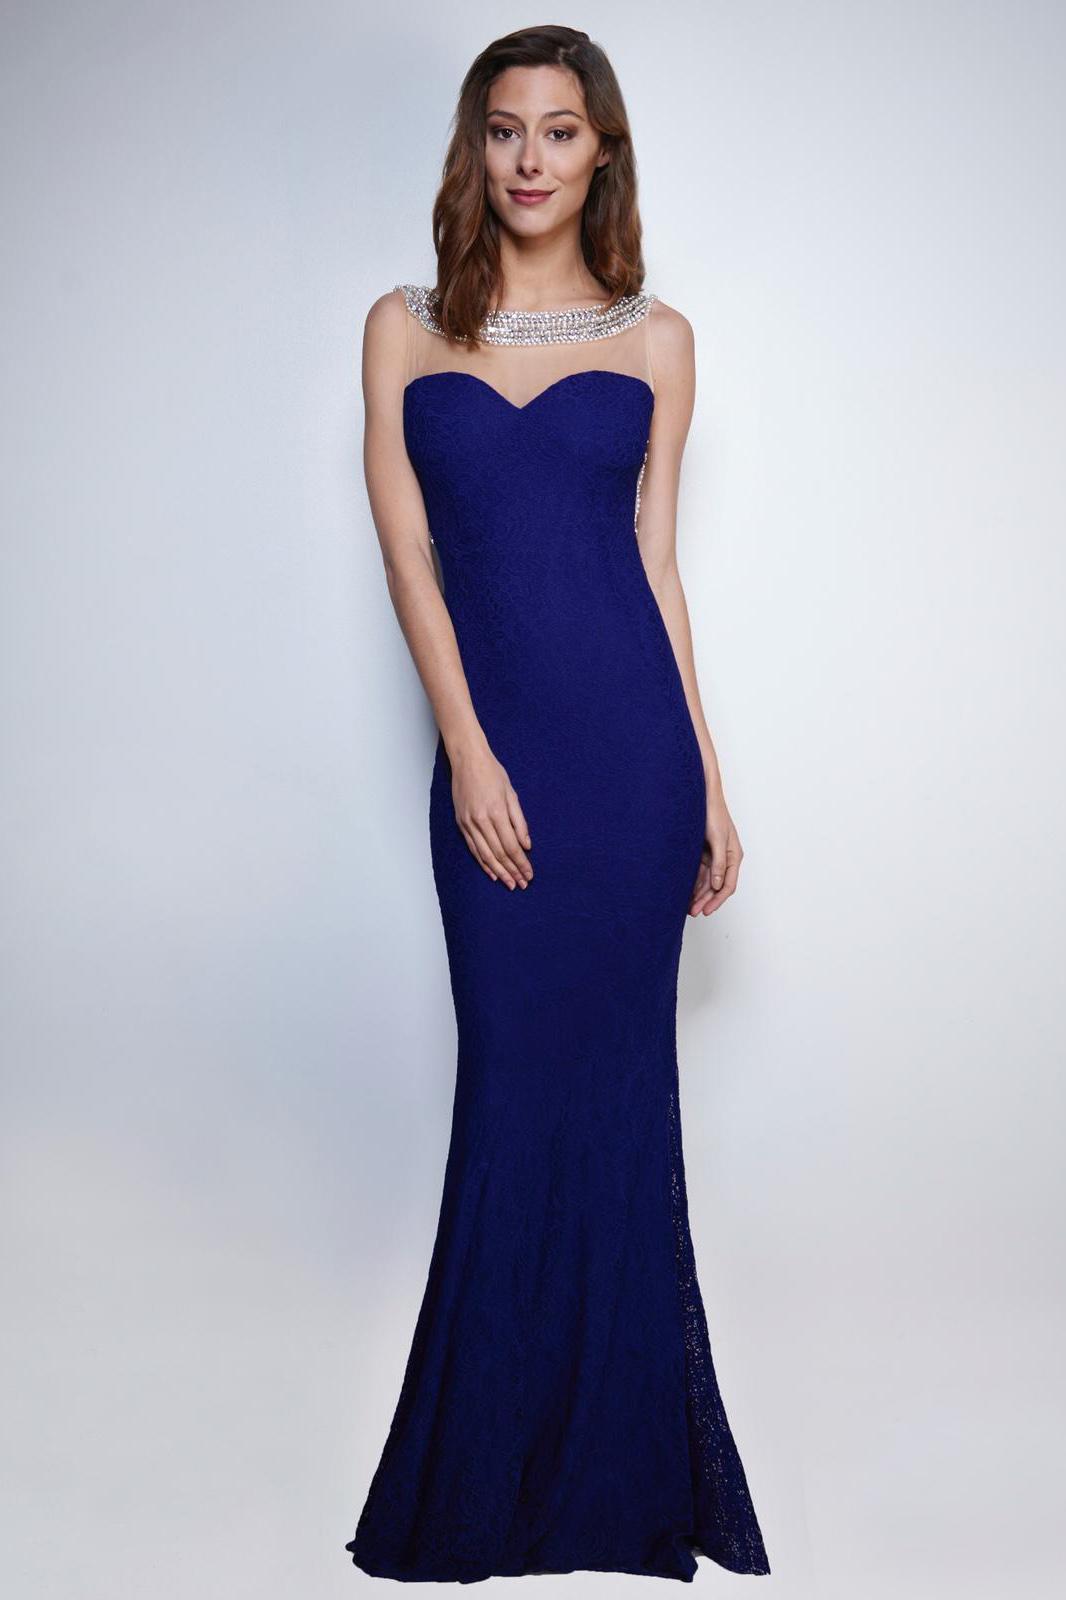 SOKY SOKA DRESS ROYAL BLUE 53017-2